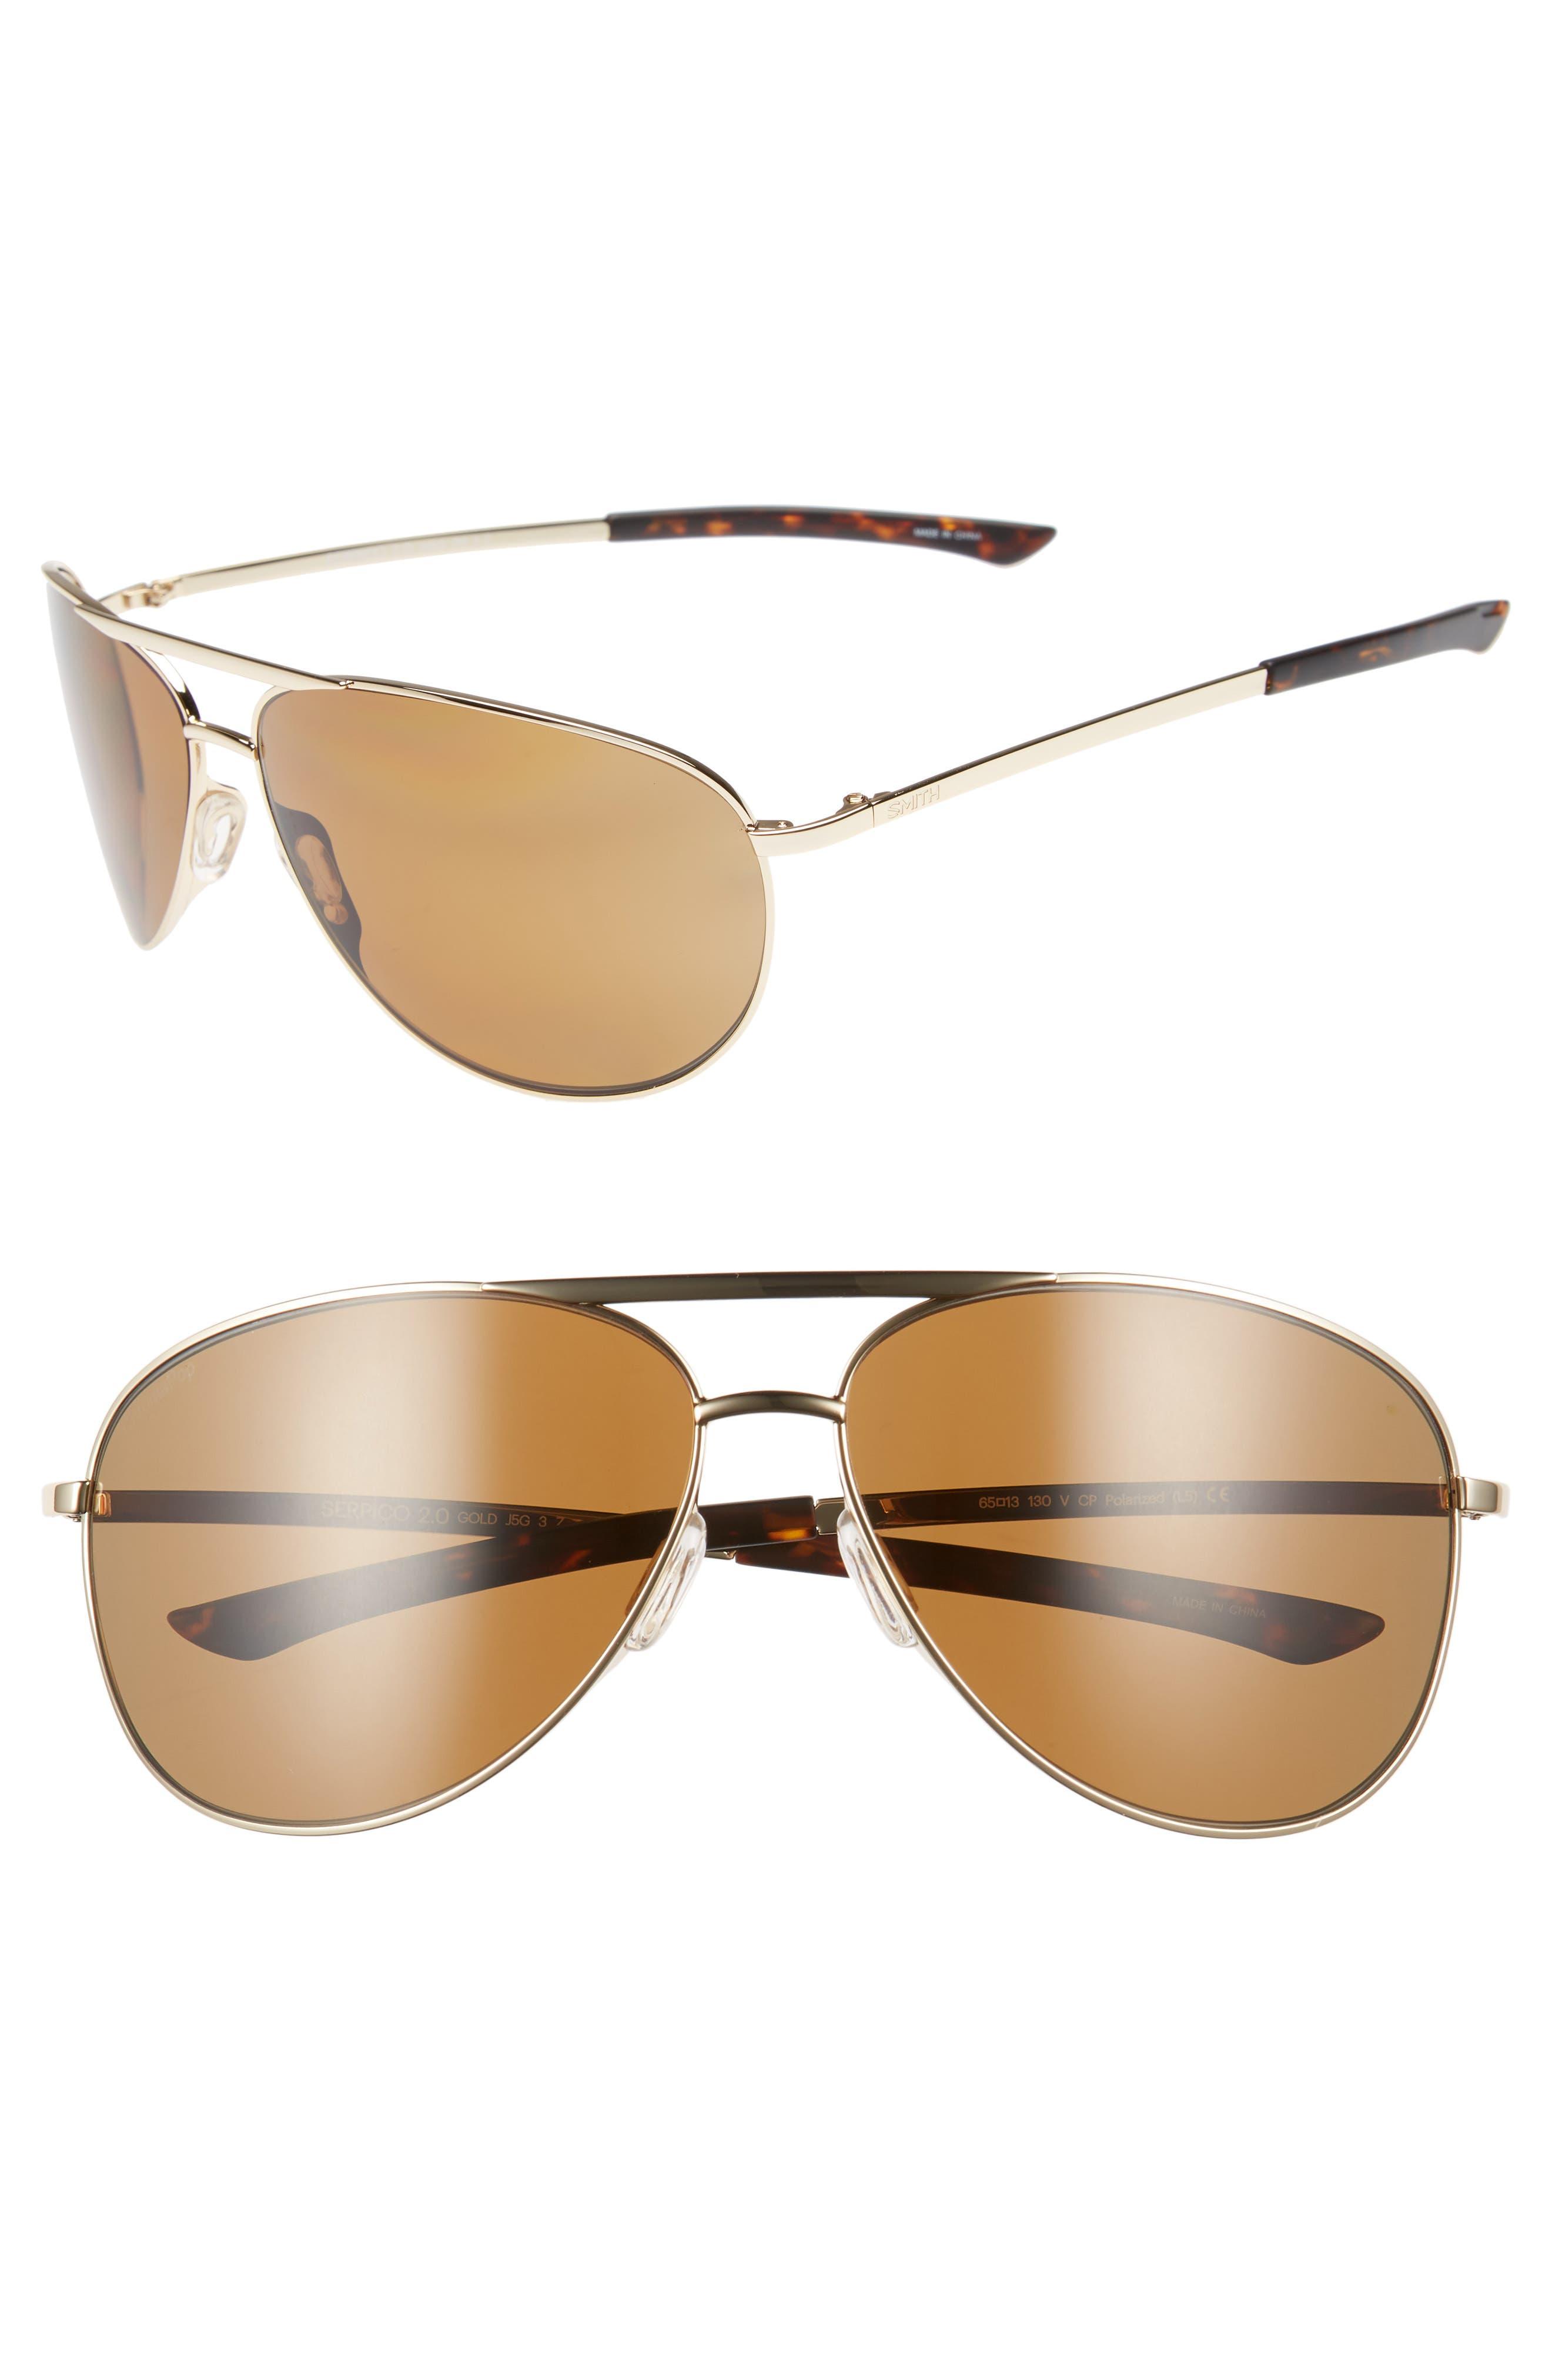 Serpico Slim 2.0 65mm ChromaPop<sup>™</sup> Polarized Aviator Sunglasses,                             Main thumbnail 1, color,                             GOLD/ BROWN POLAR